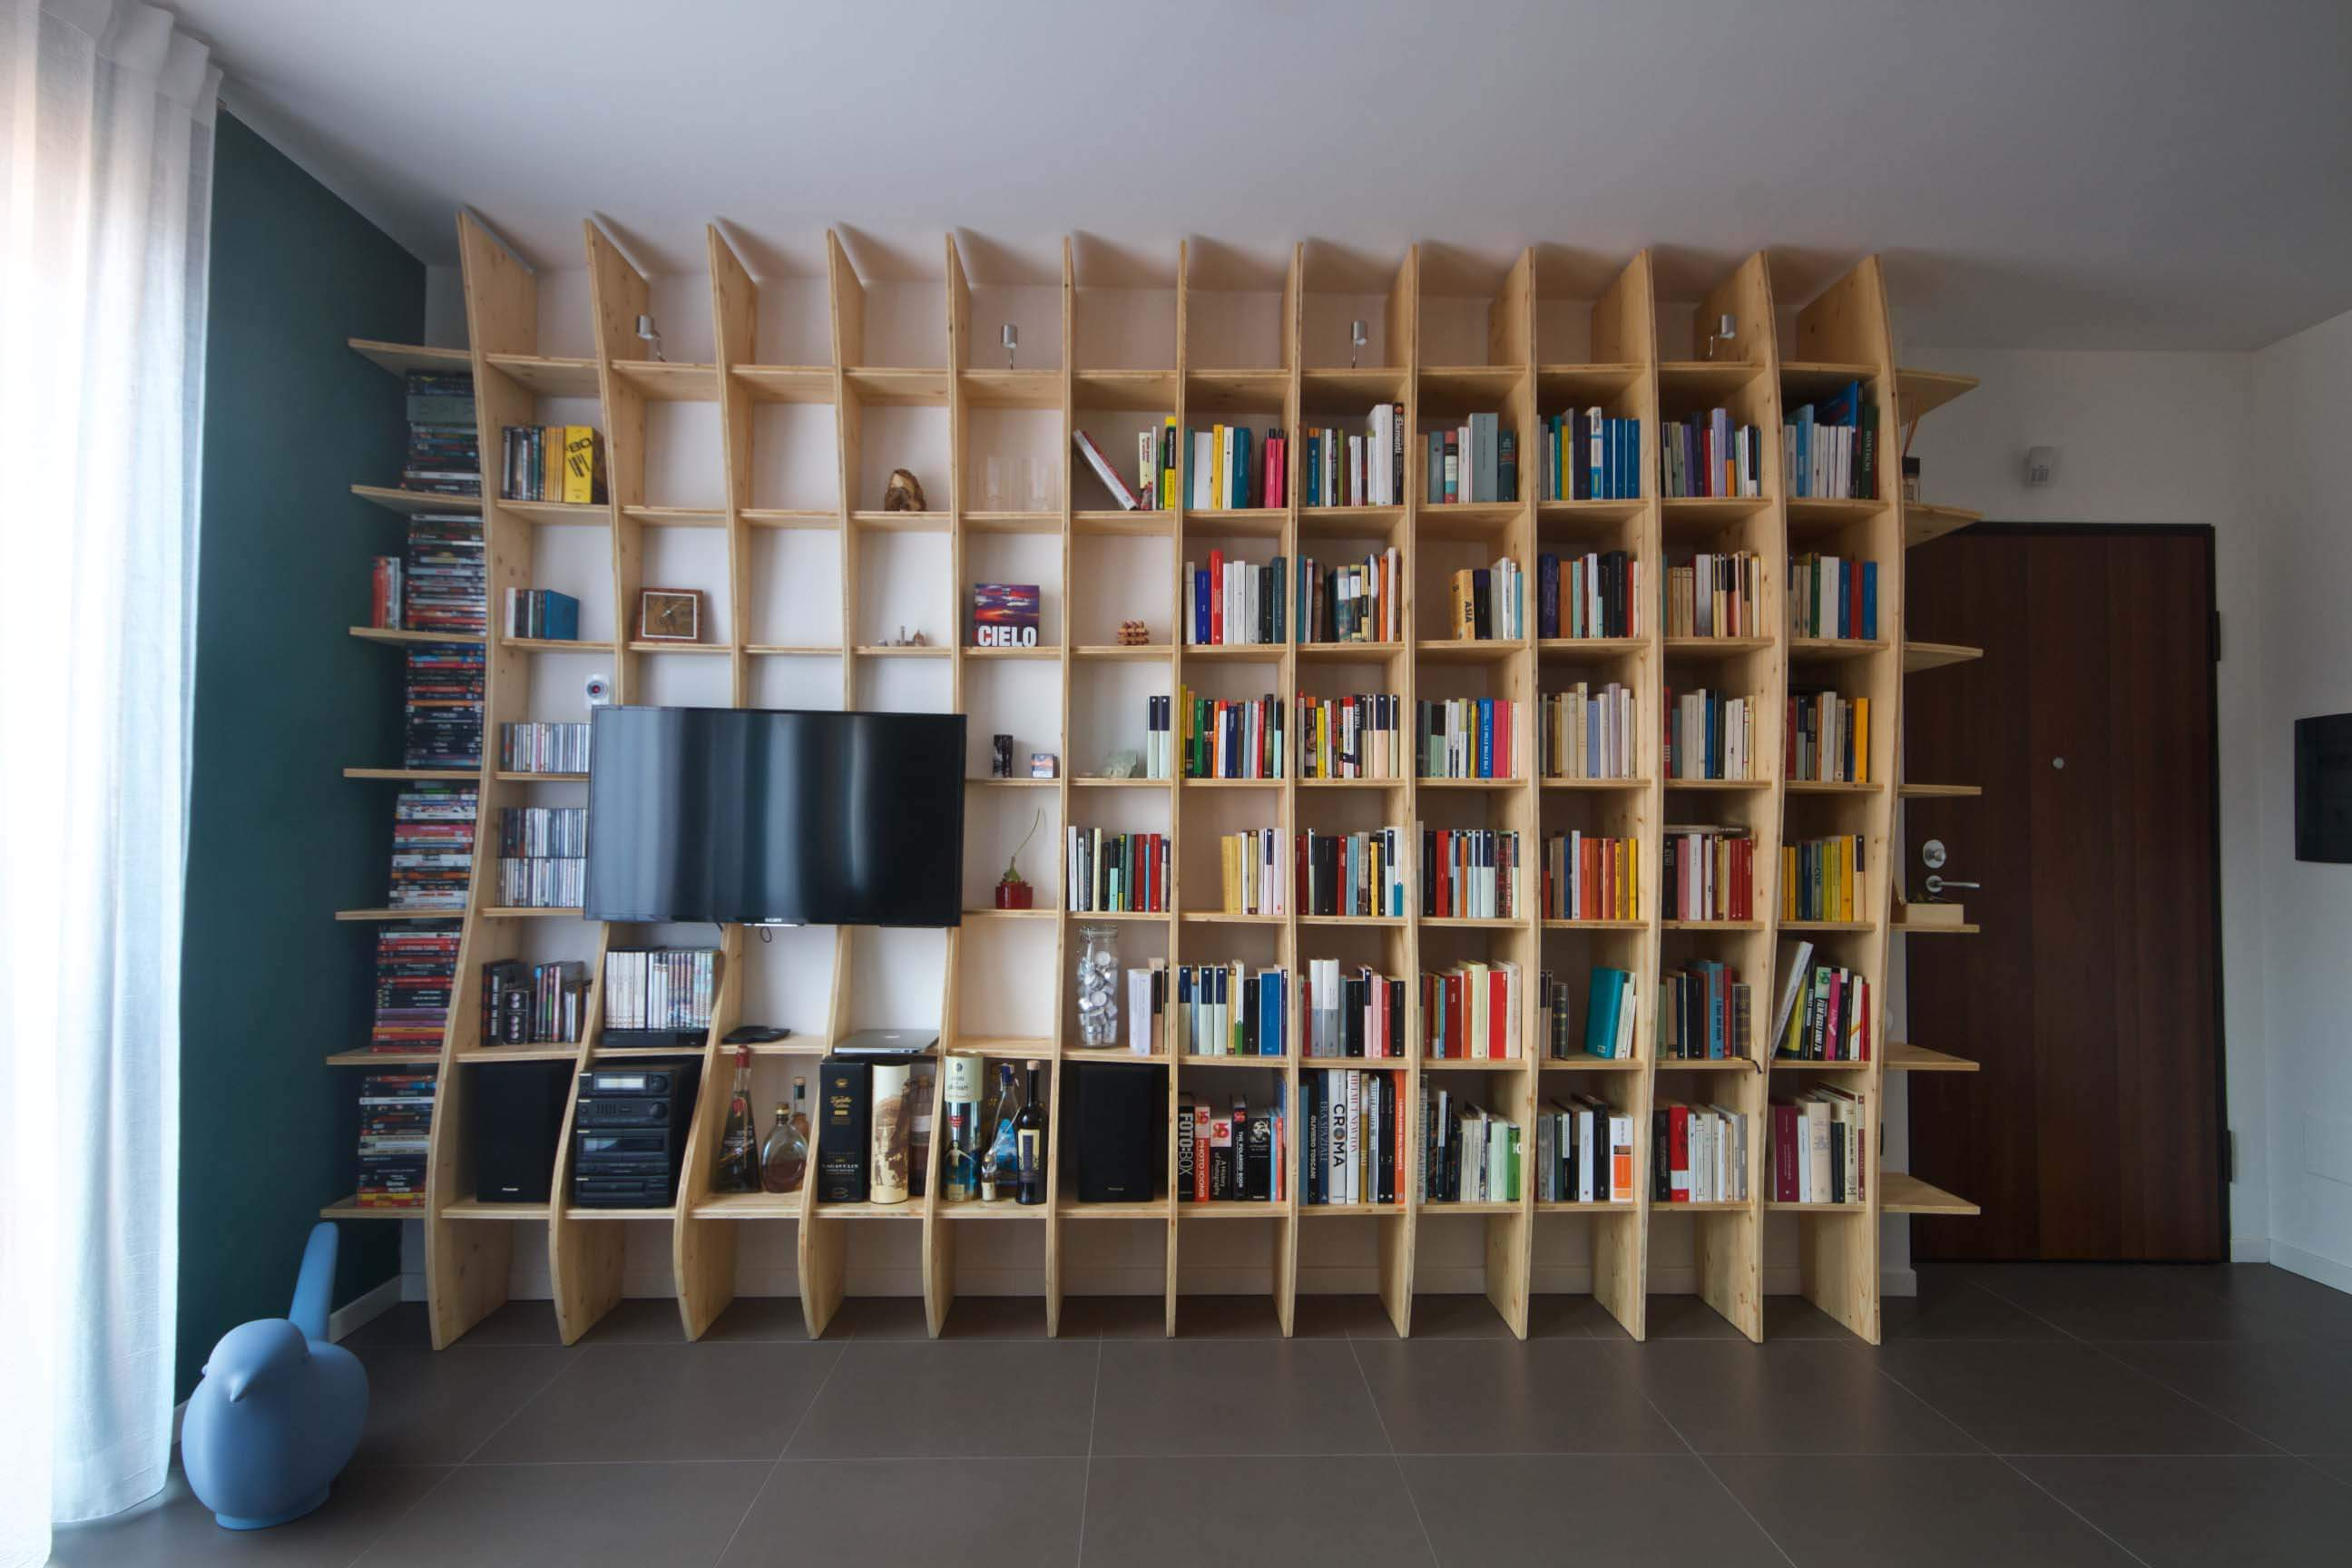 elisa_macchi_libreria_vp_vista_frontale